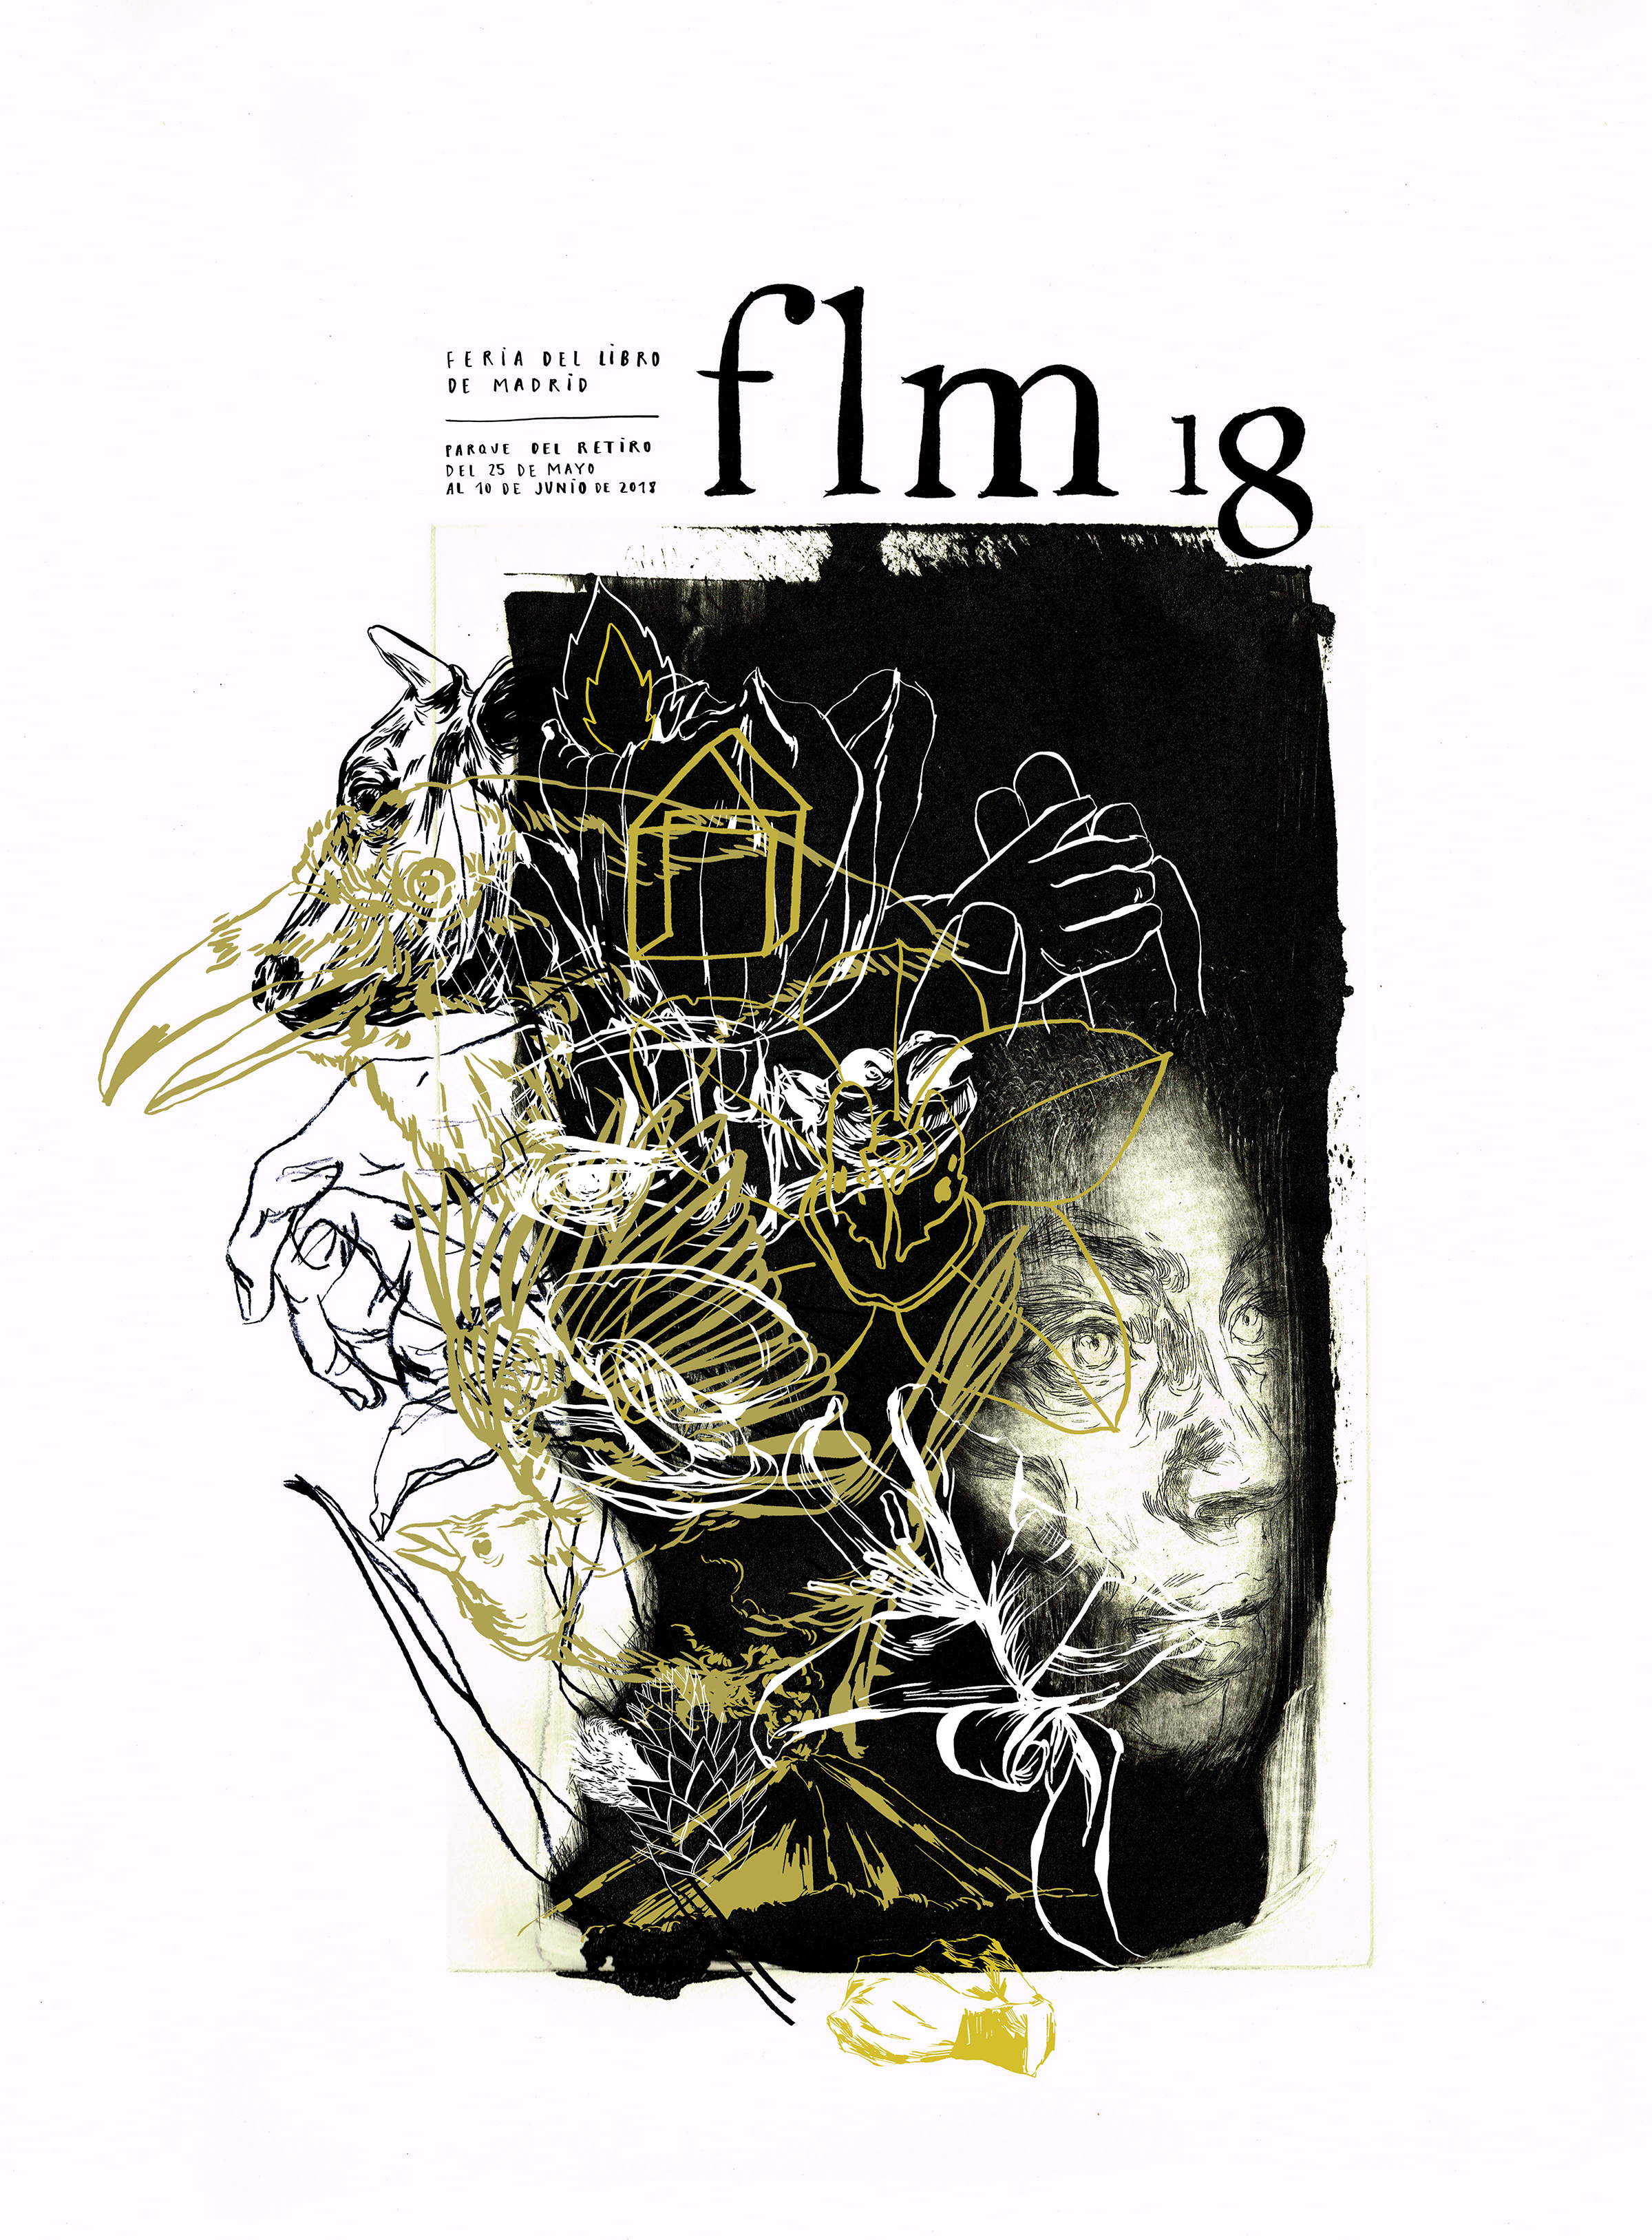 El cartel de la Feria del Libro de Madrid, de Paula Bonet